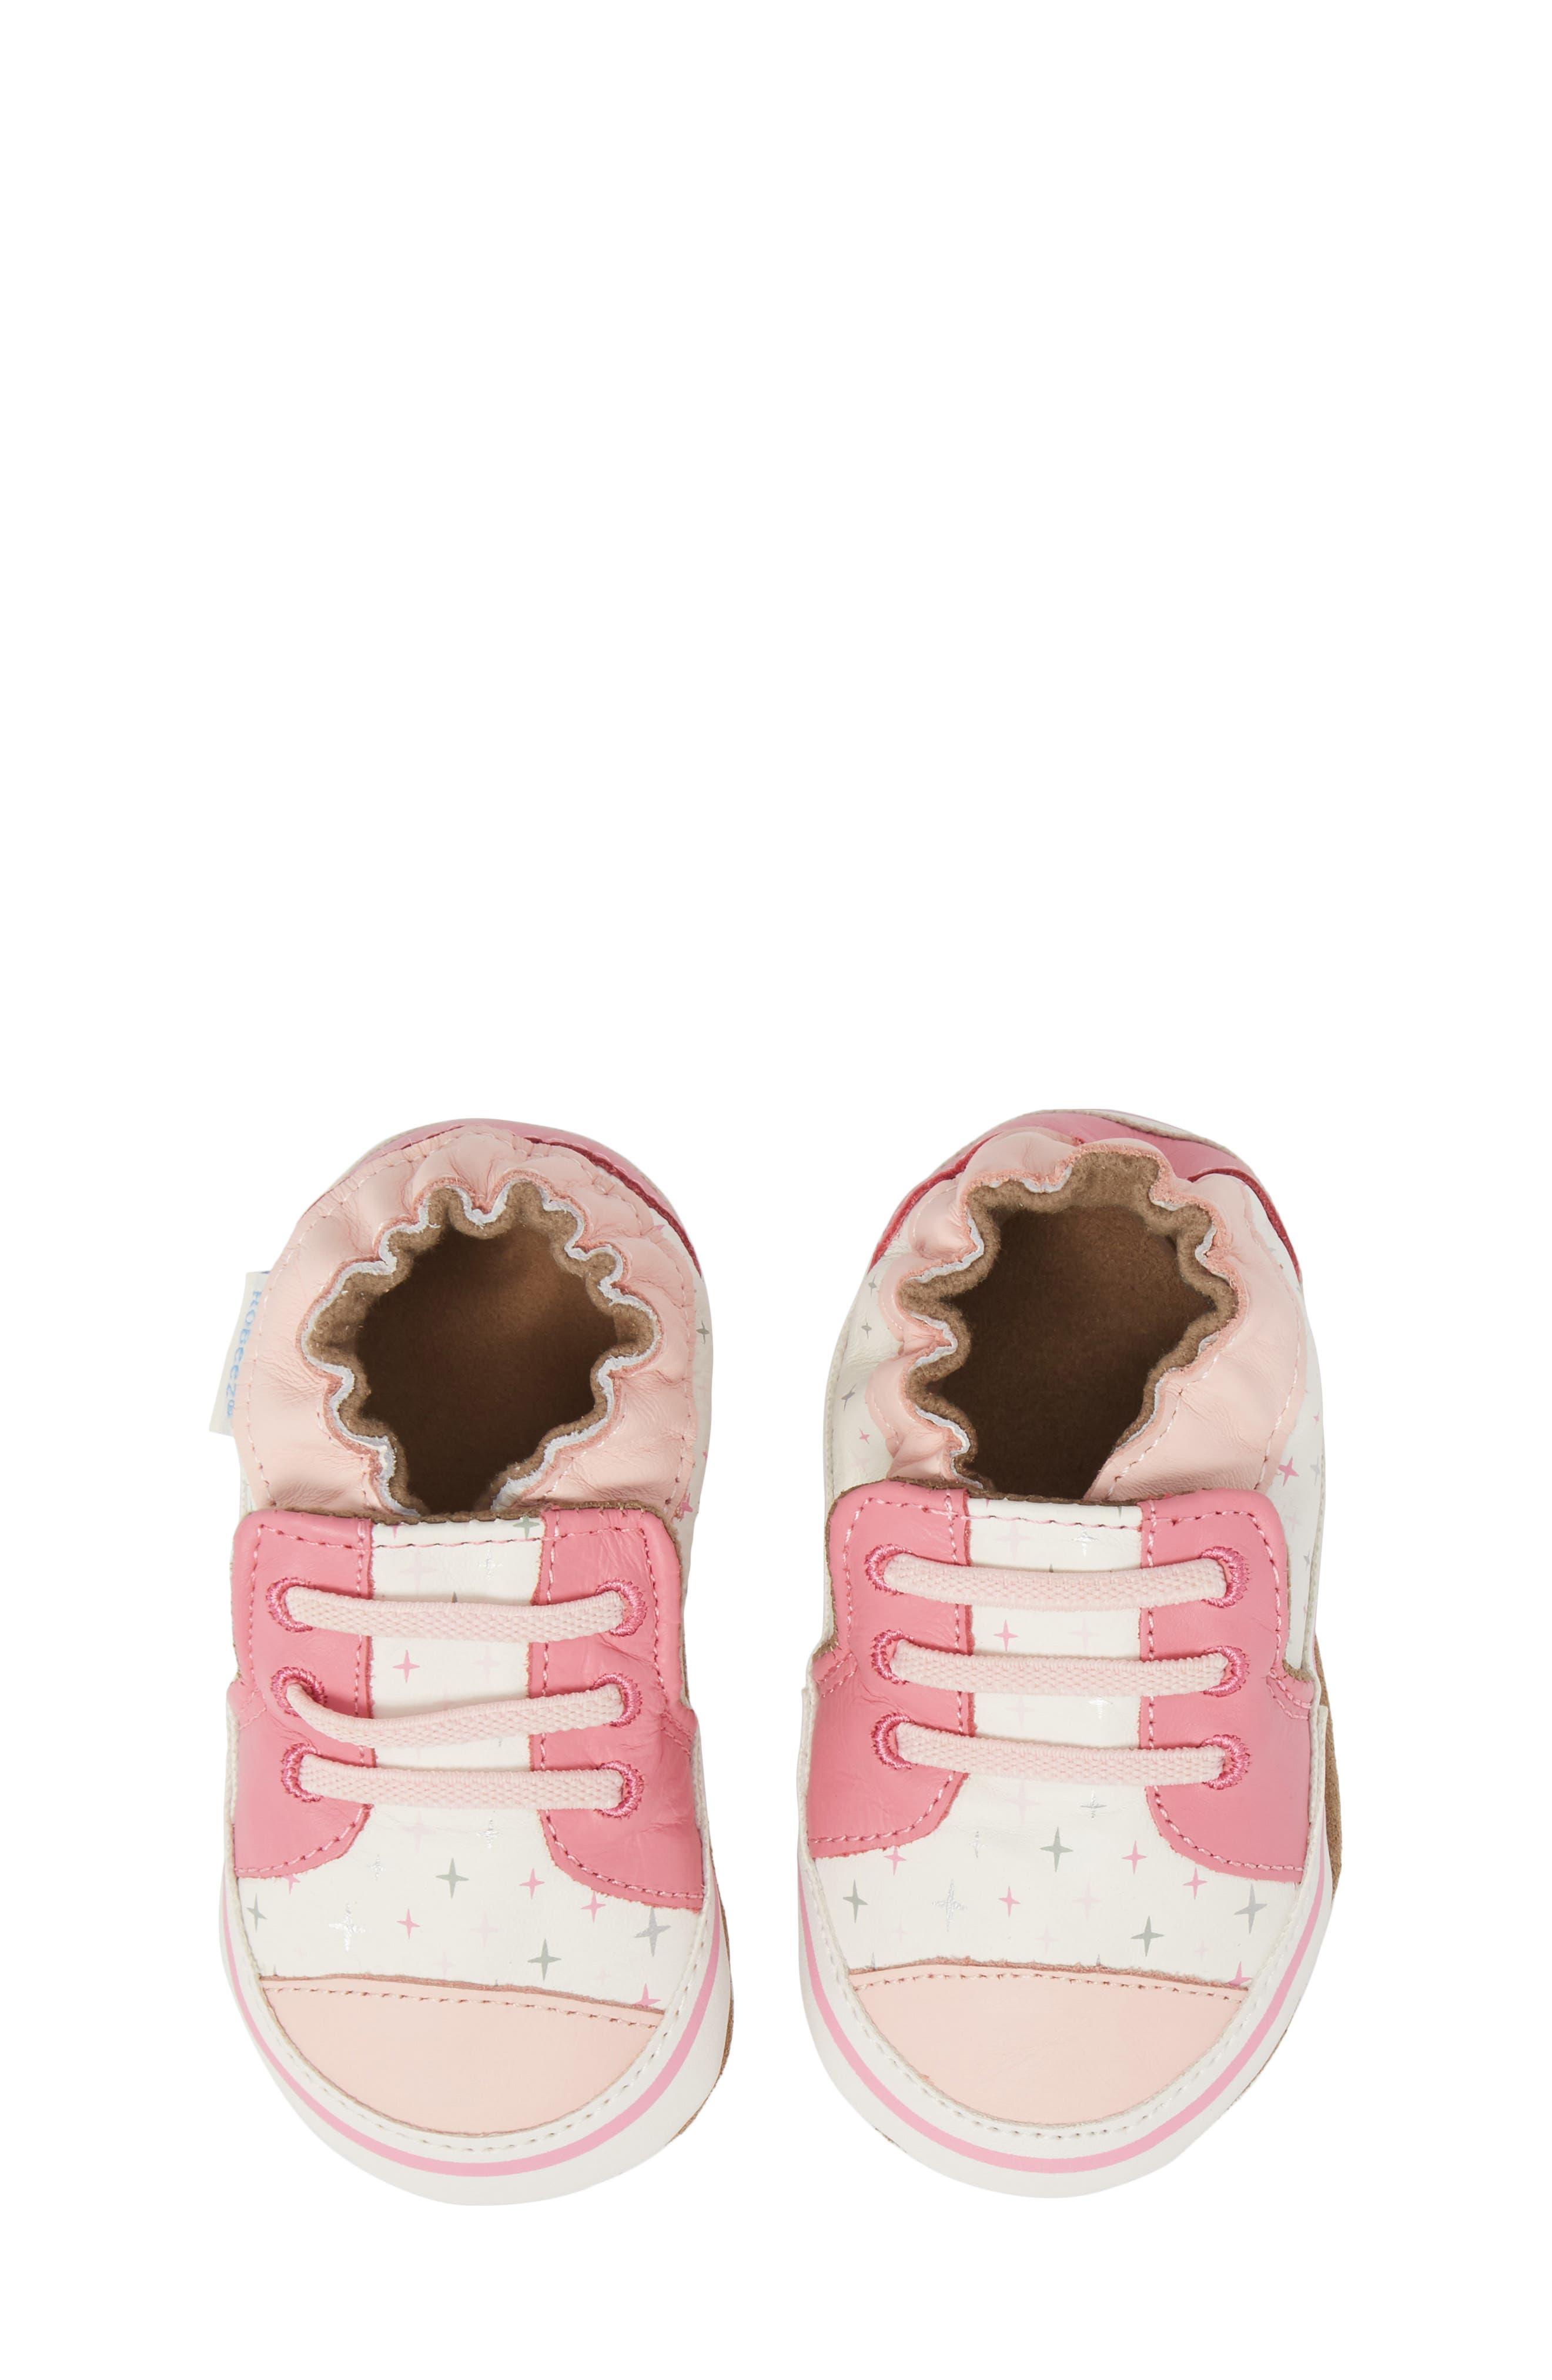 Main Image - Robeez® Trendy Trainer Sneaker Crib Shoe (Baby)